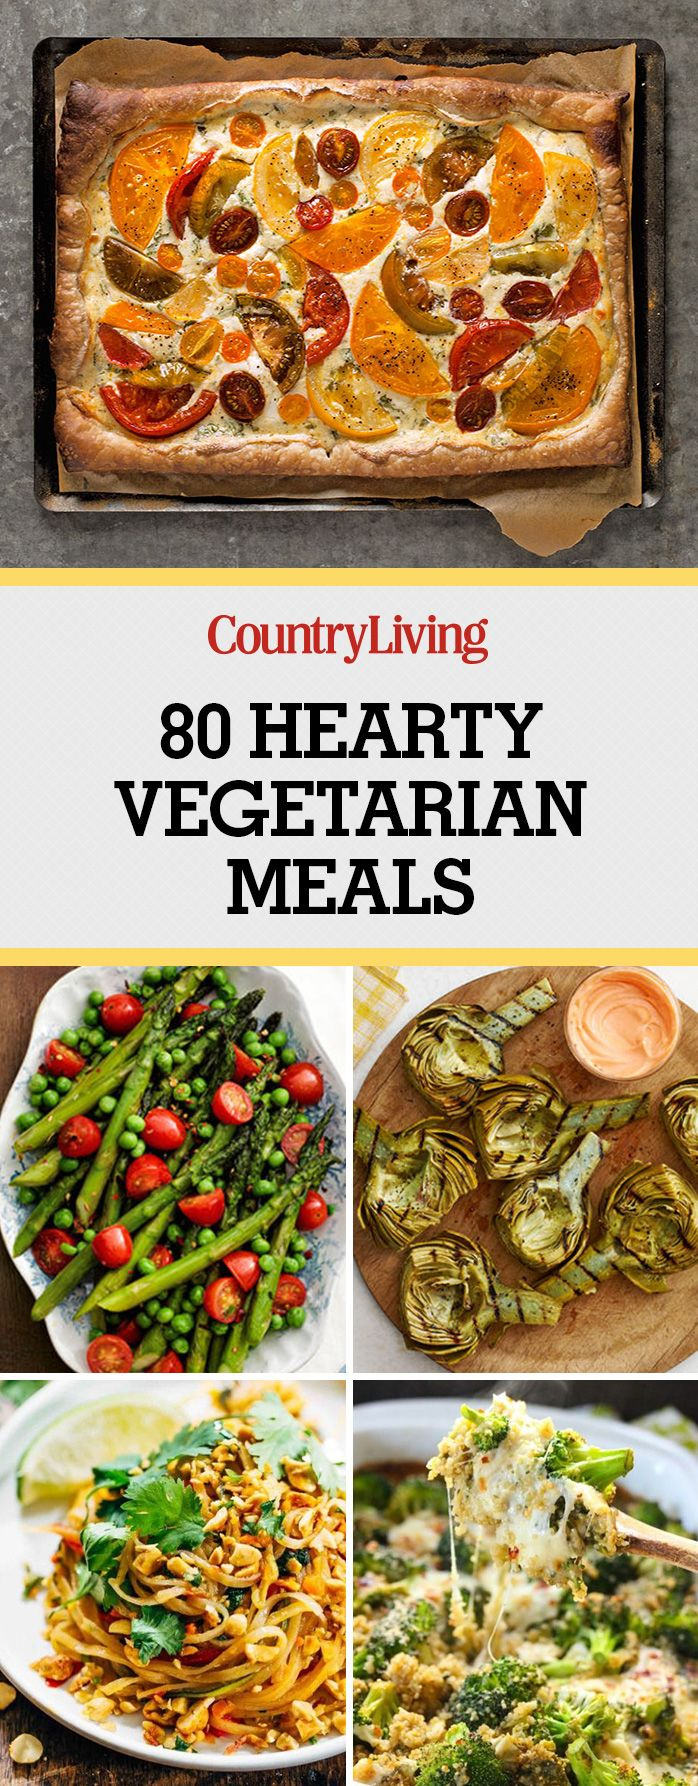 80 easy vegetarian dinner recipes best vegetarian meal ideas 80 easy vegetarian dinner recipes best vegetarian meal ideas country living forumfinder Image collections